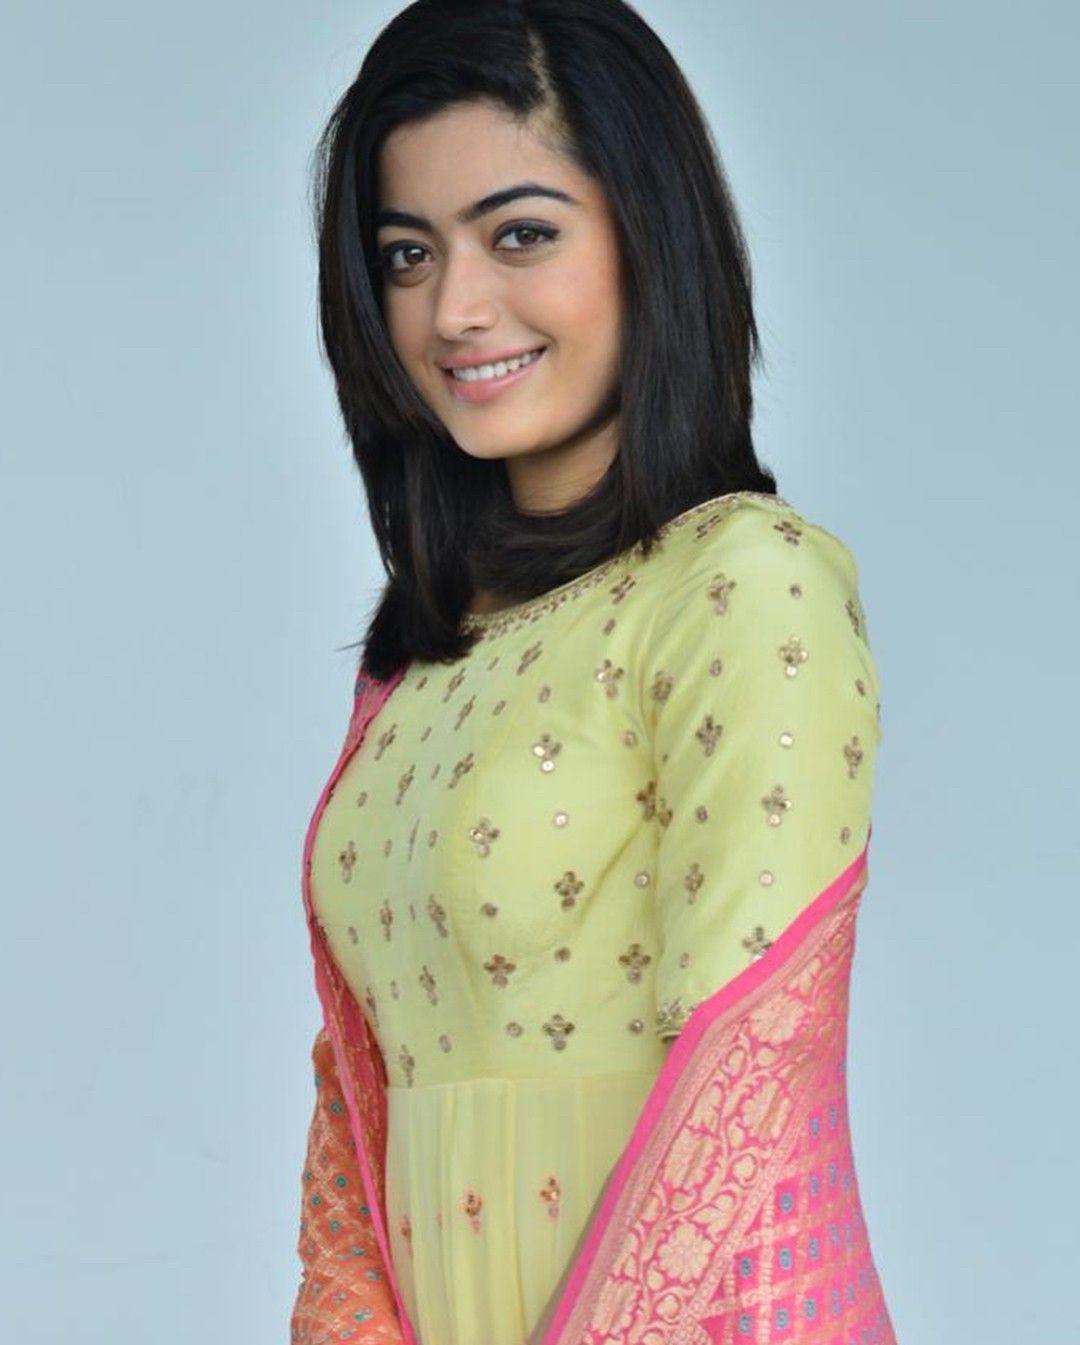 rashmika mandanna short hair look | celebrity collection in